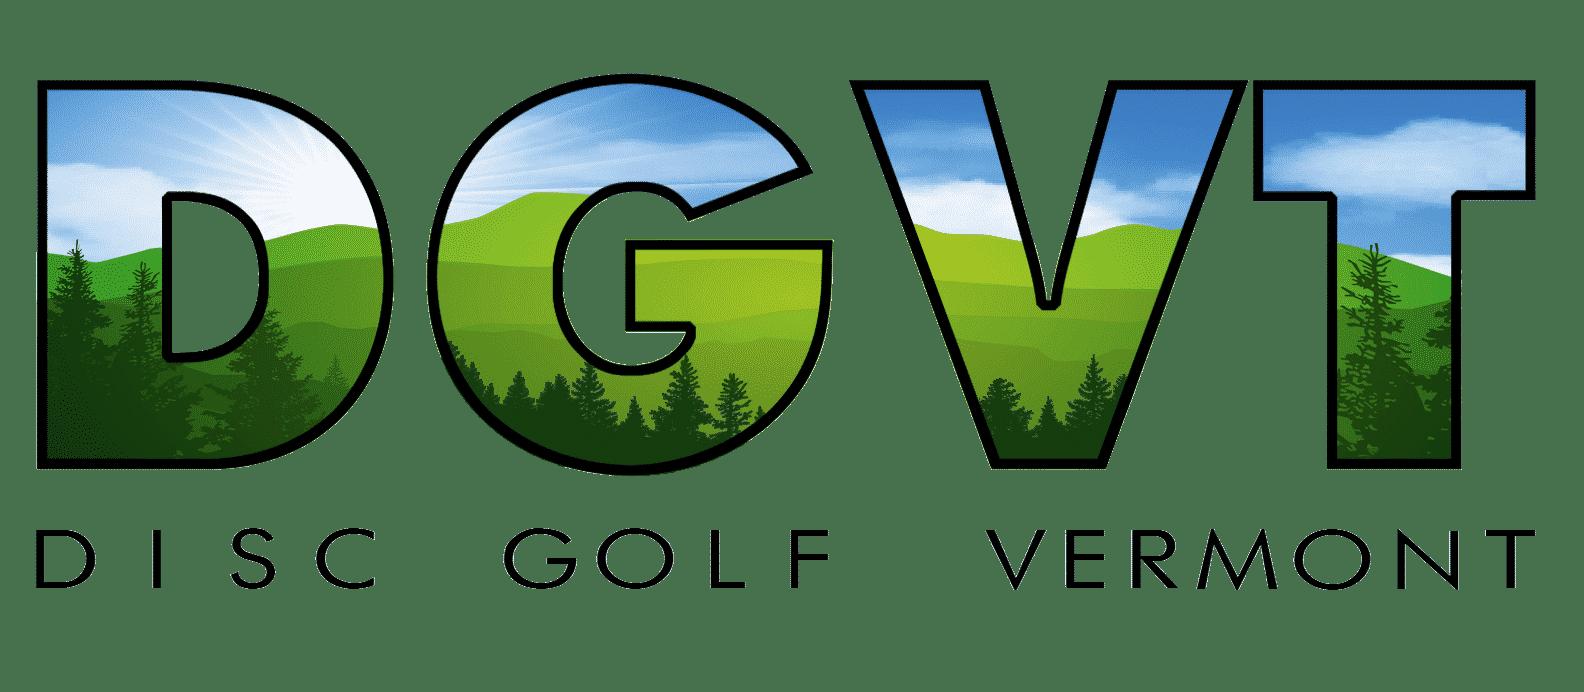 Disc Golf Vermont Disc Golf Club